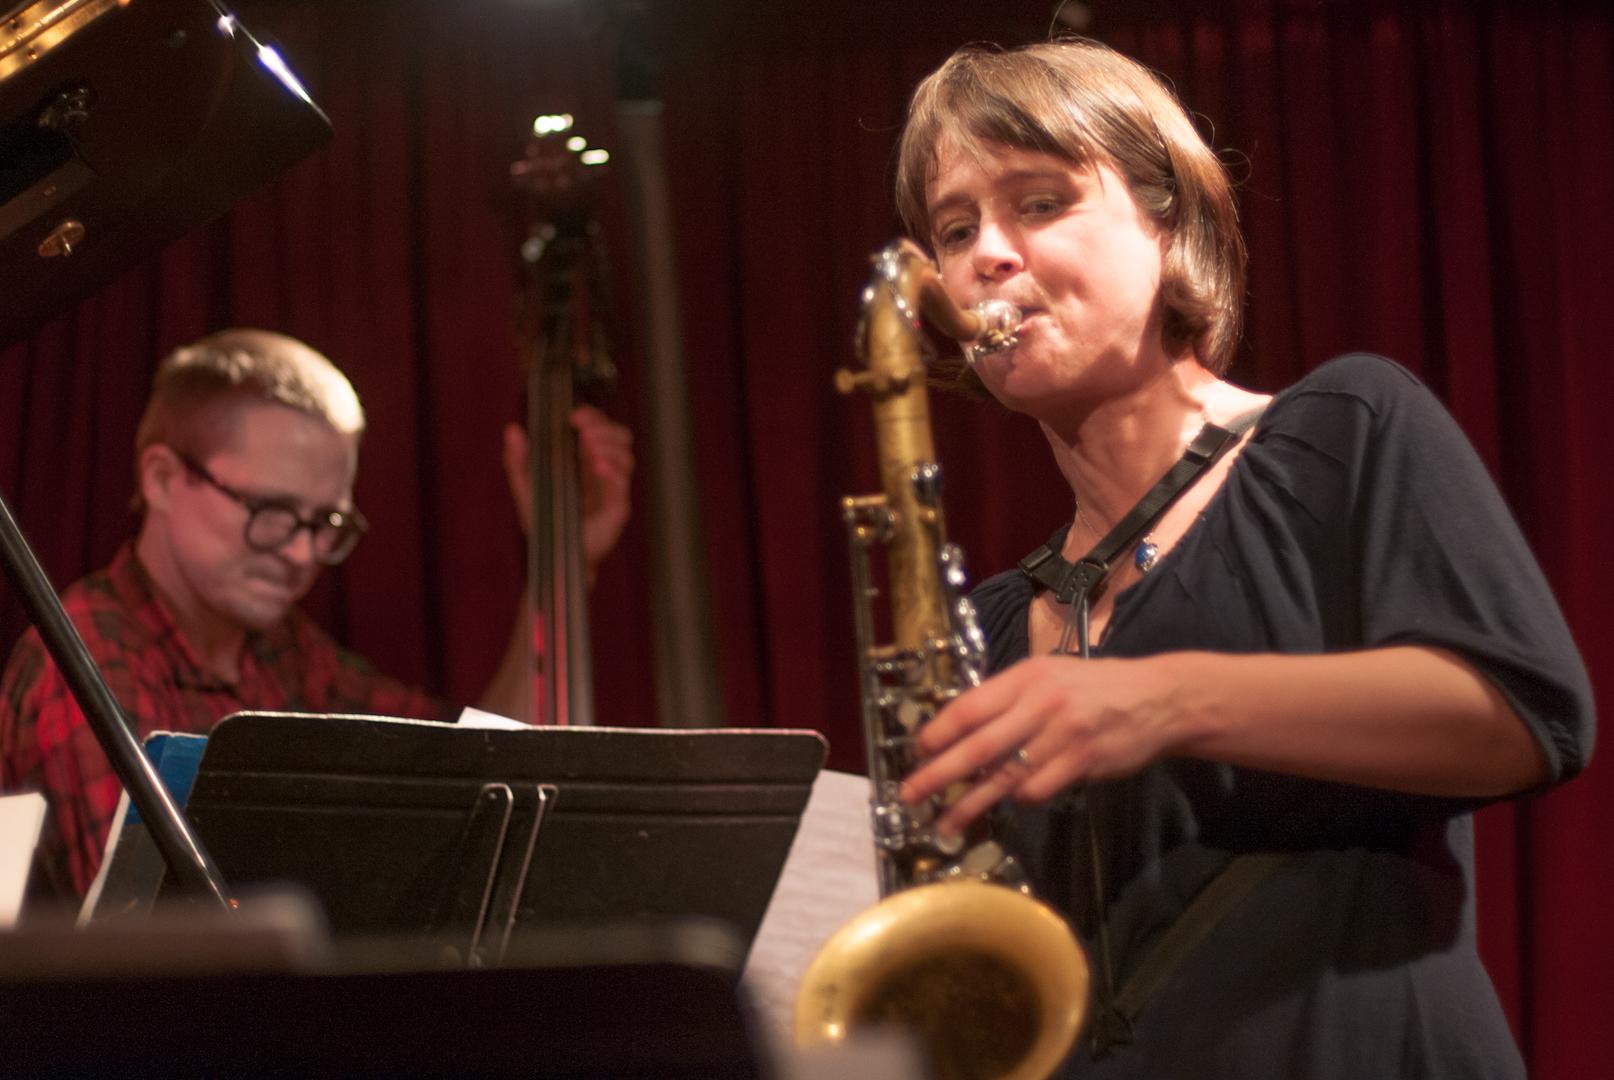 Eivind Opsvik and Ingrid Laubrock with the Kris Davis Quintet at the Cornelia Street Cafe